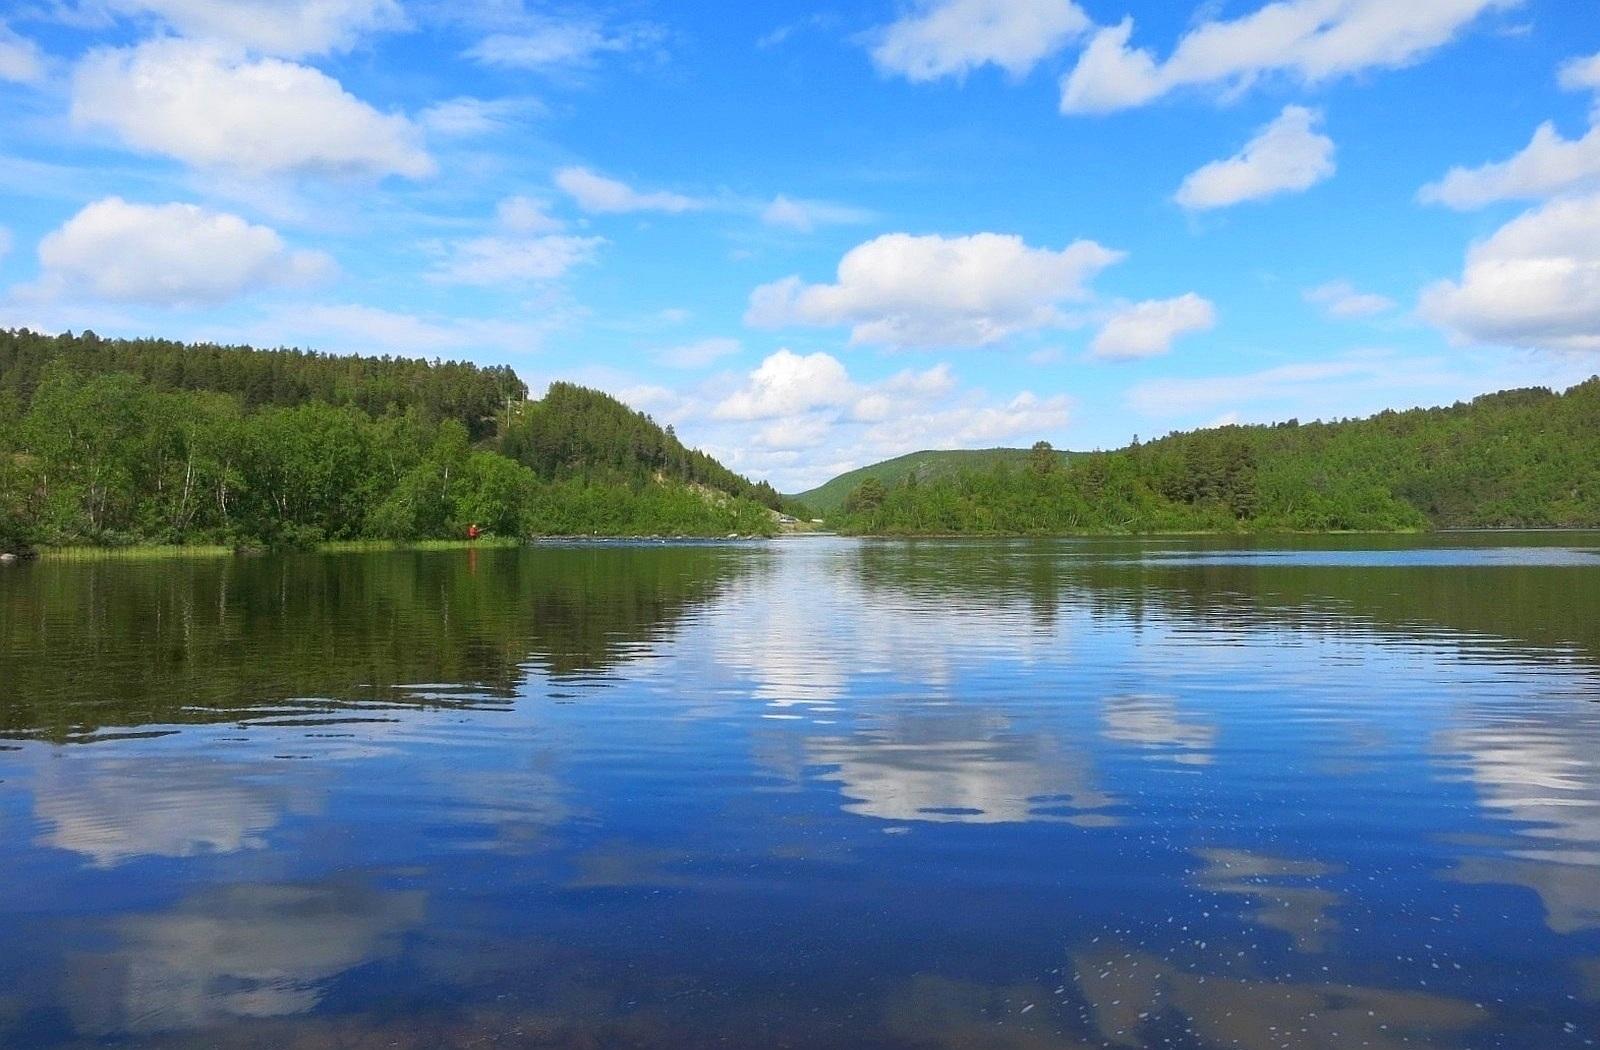 Tiedosto lake kenesj rvi in summer wikipedia for Summer lake